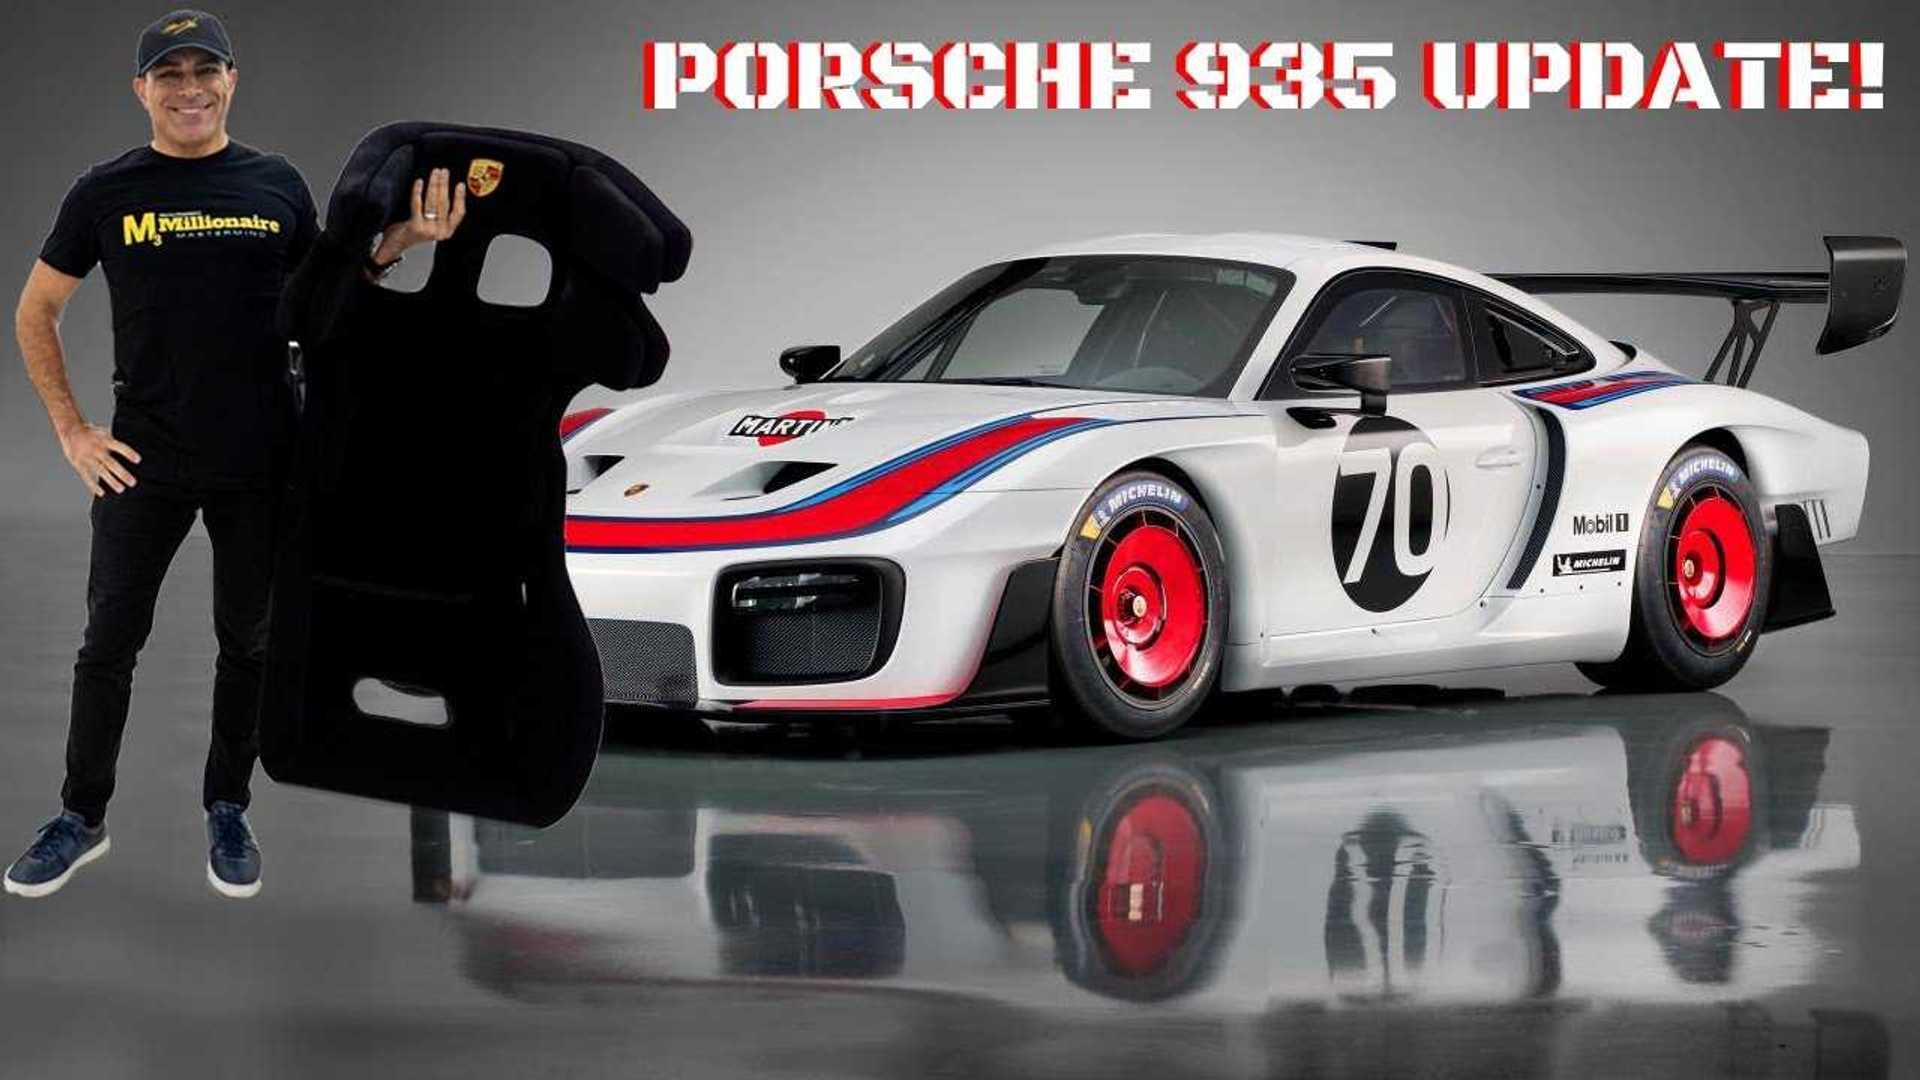 Porsche 935 passenger seat is a £7,500 option